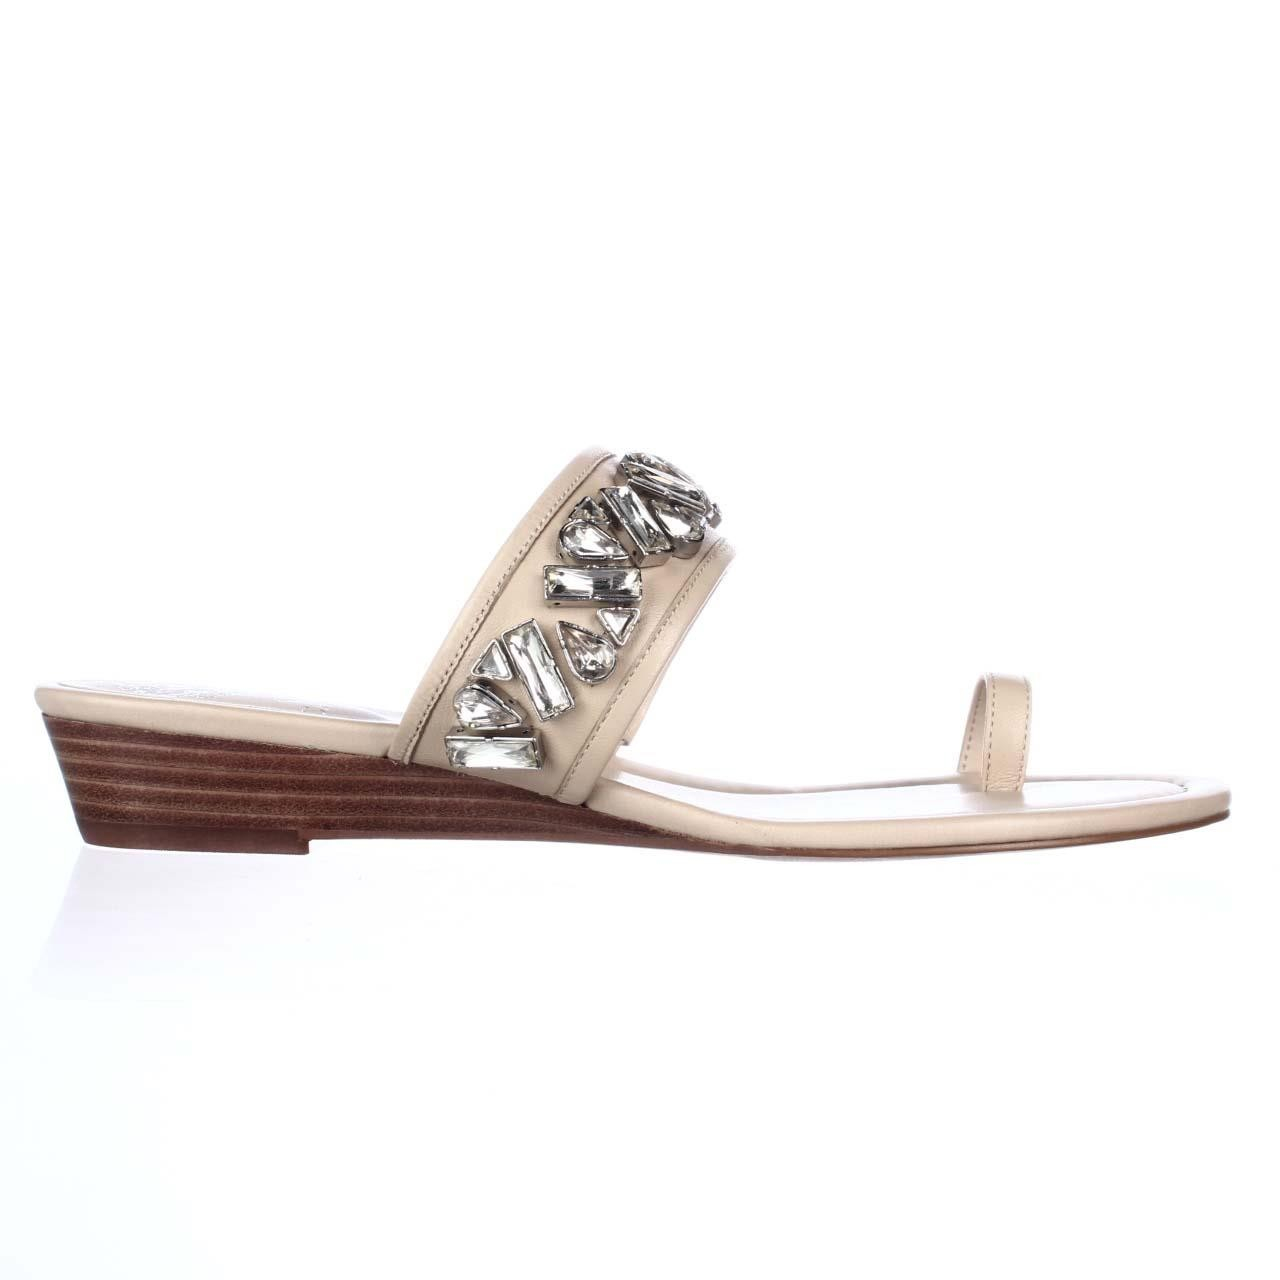 Vince Camuto Wedding Shoes Uk